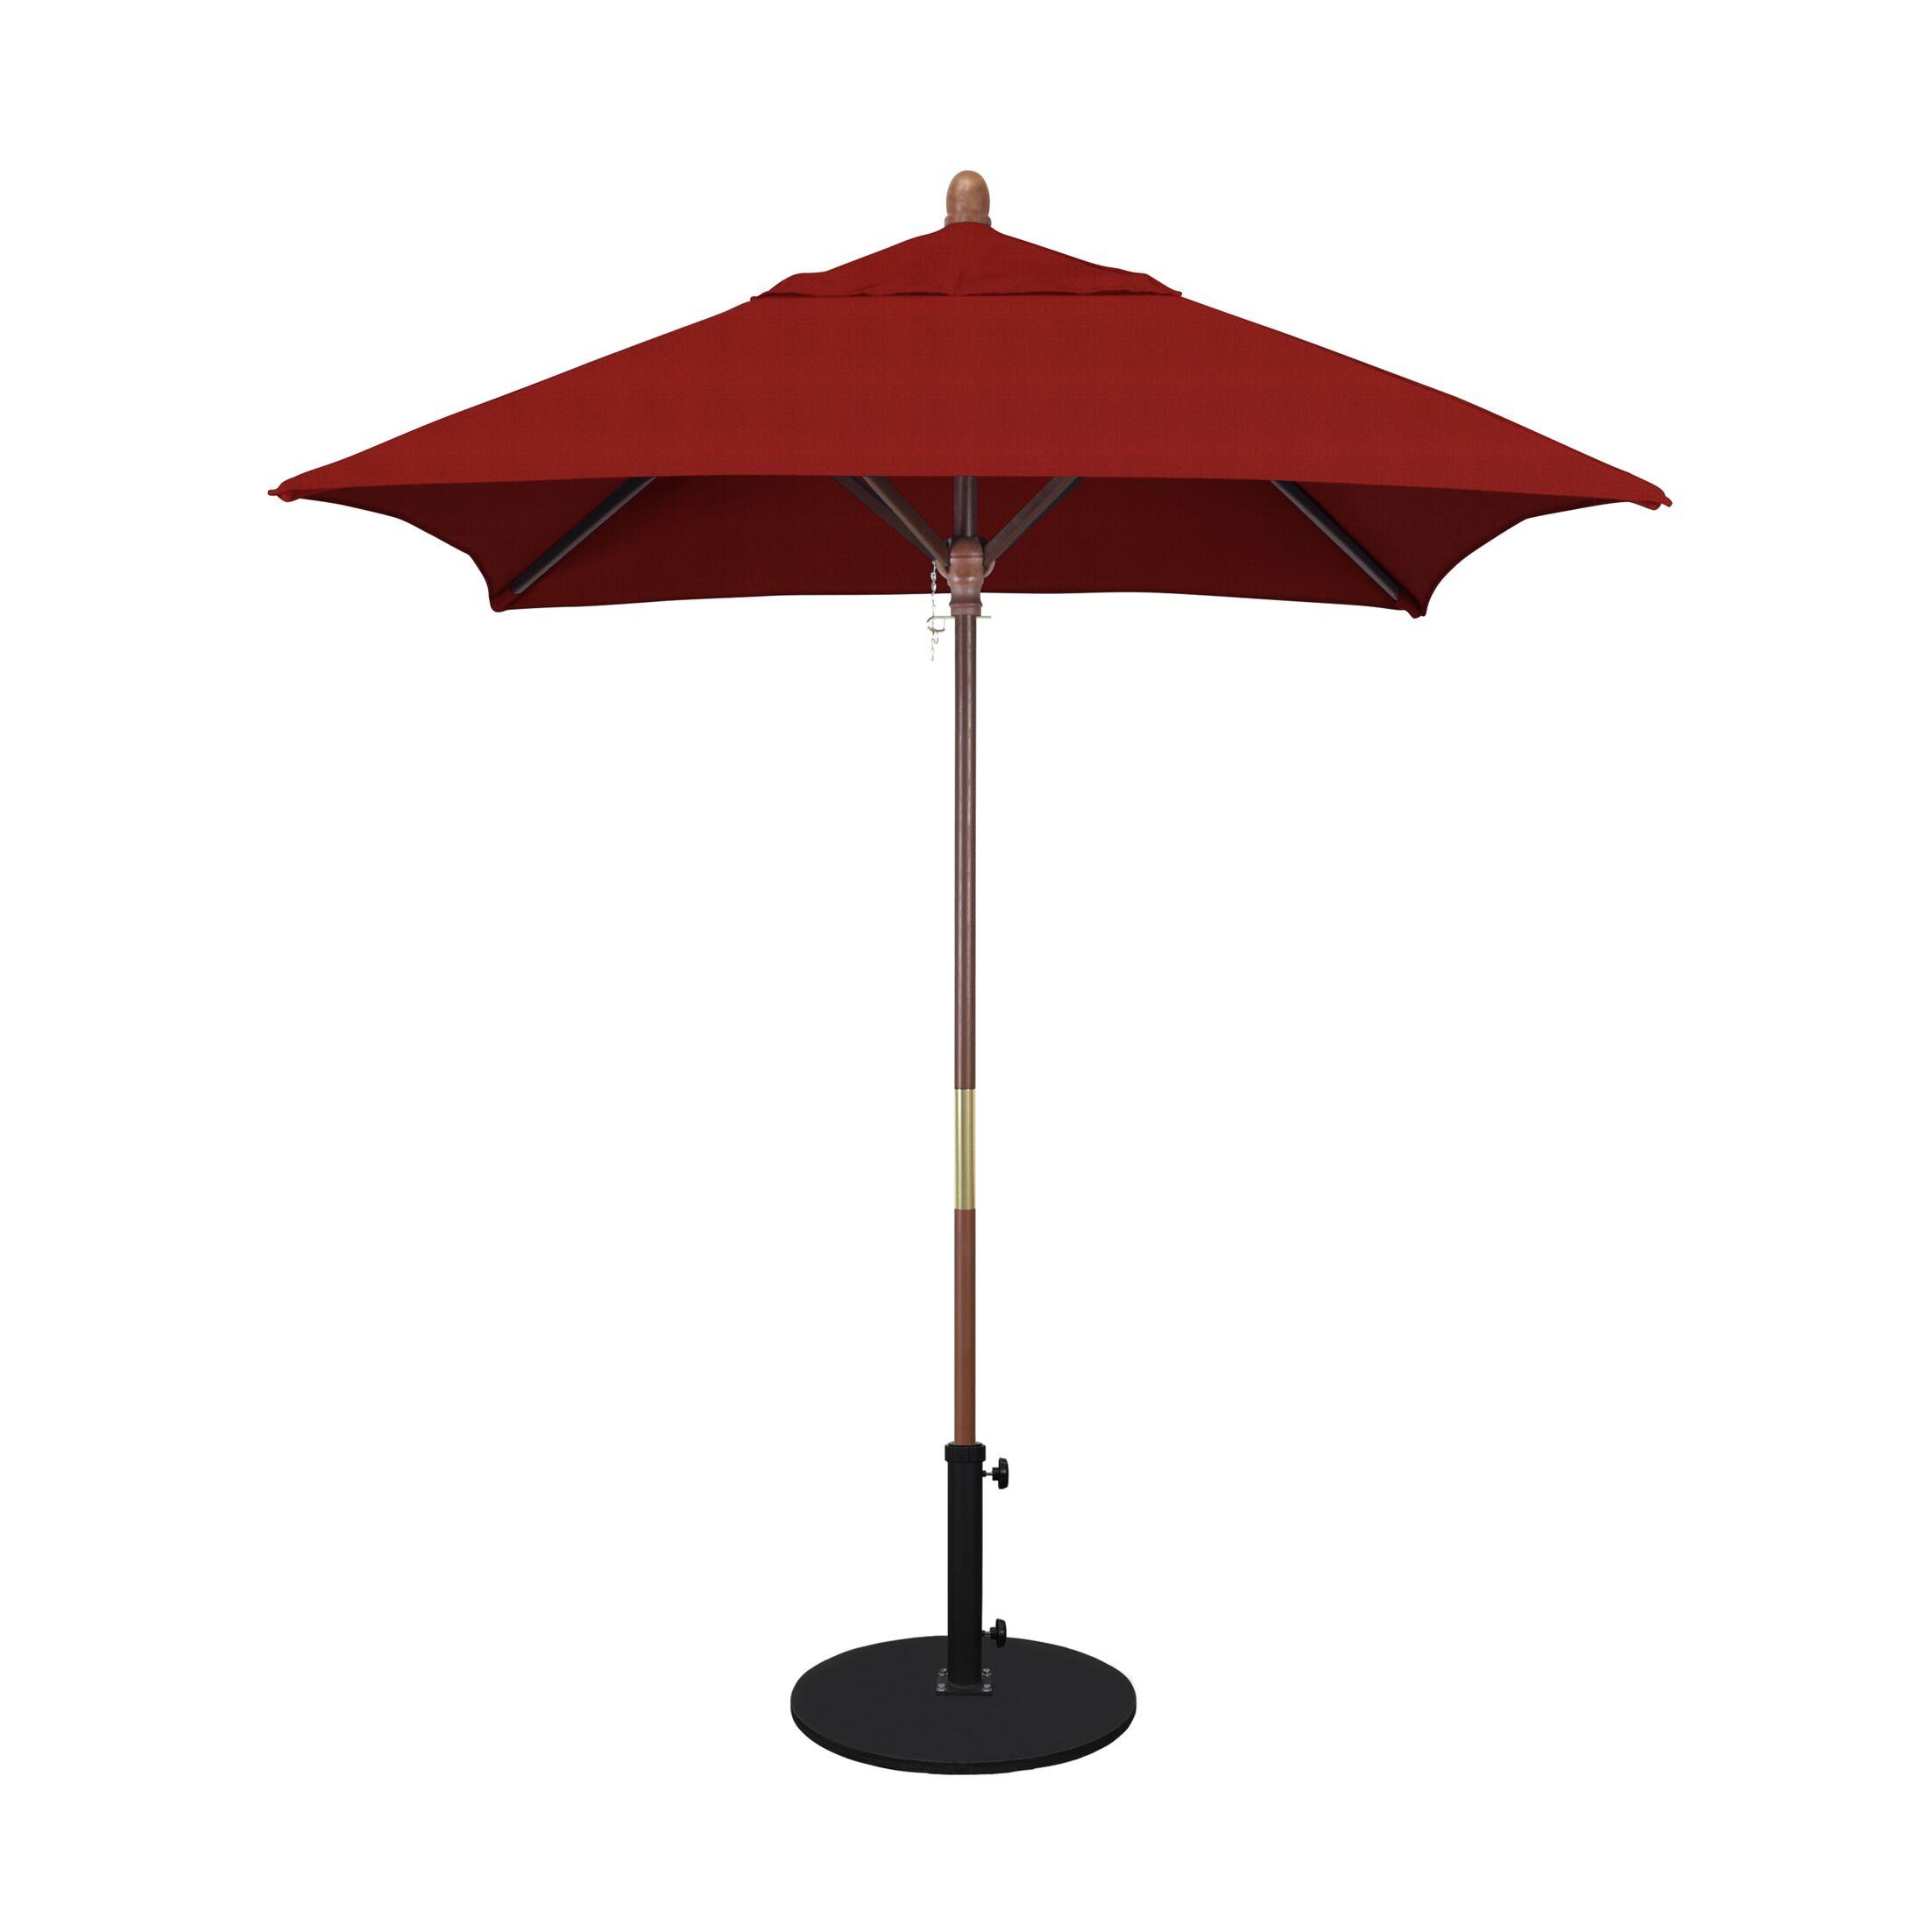 Burl 6' Square Market Umbrella Fabric: Sunbrella AA Jockey Red